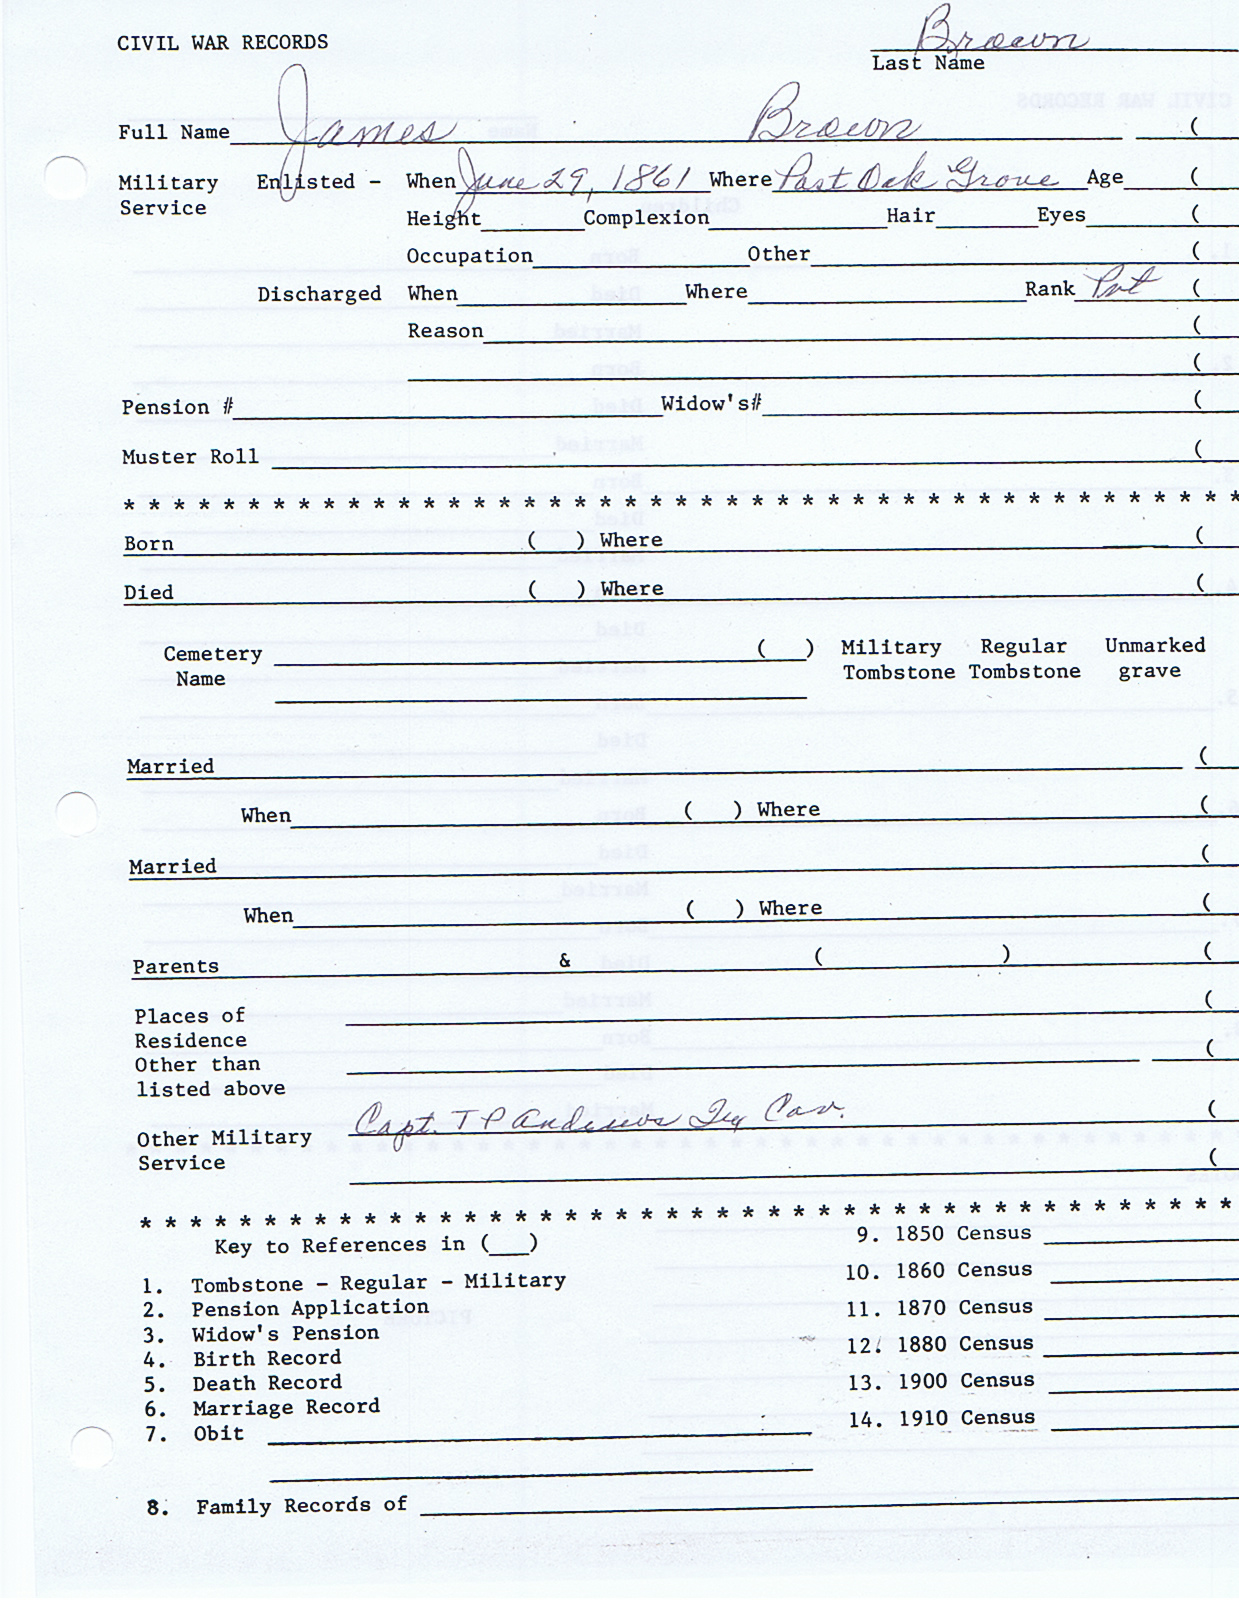 brown-kaufman_civil_war_records-3526